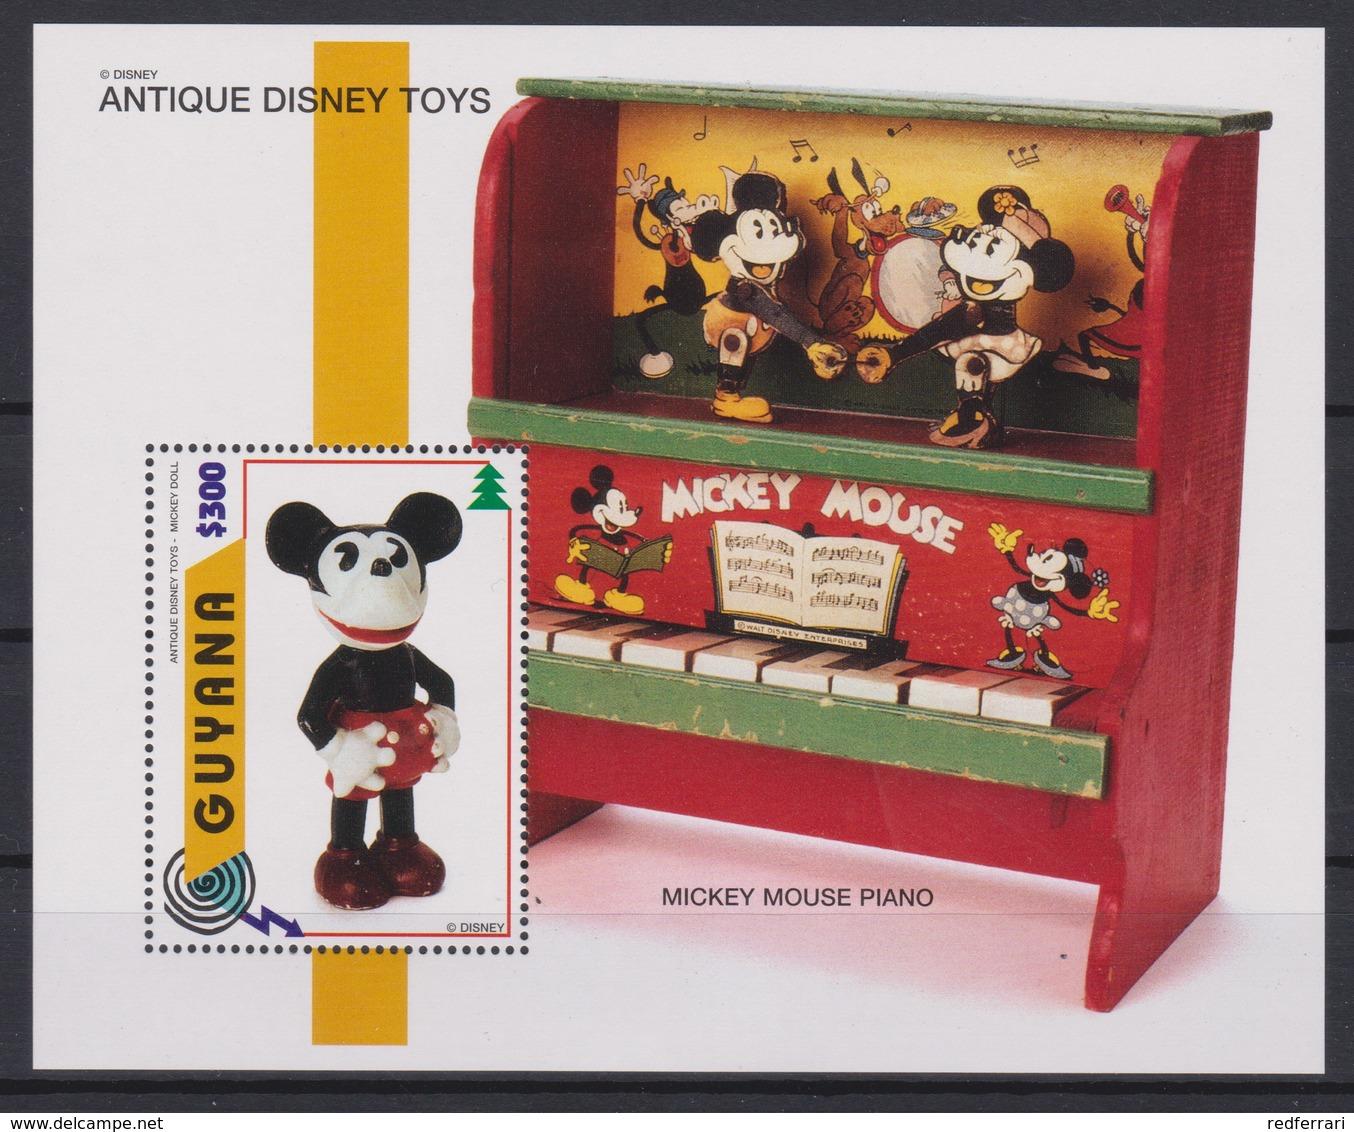 2337  WALT DISNEY - GUYANA ( Disney Anticque Toys ) Pluto Wind-Up / Mickey Mouse Piano . - Disney